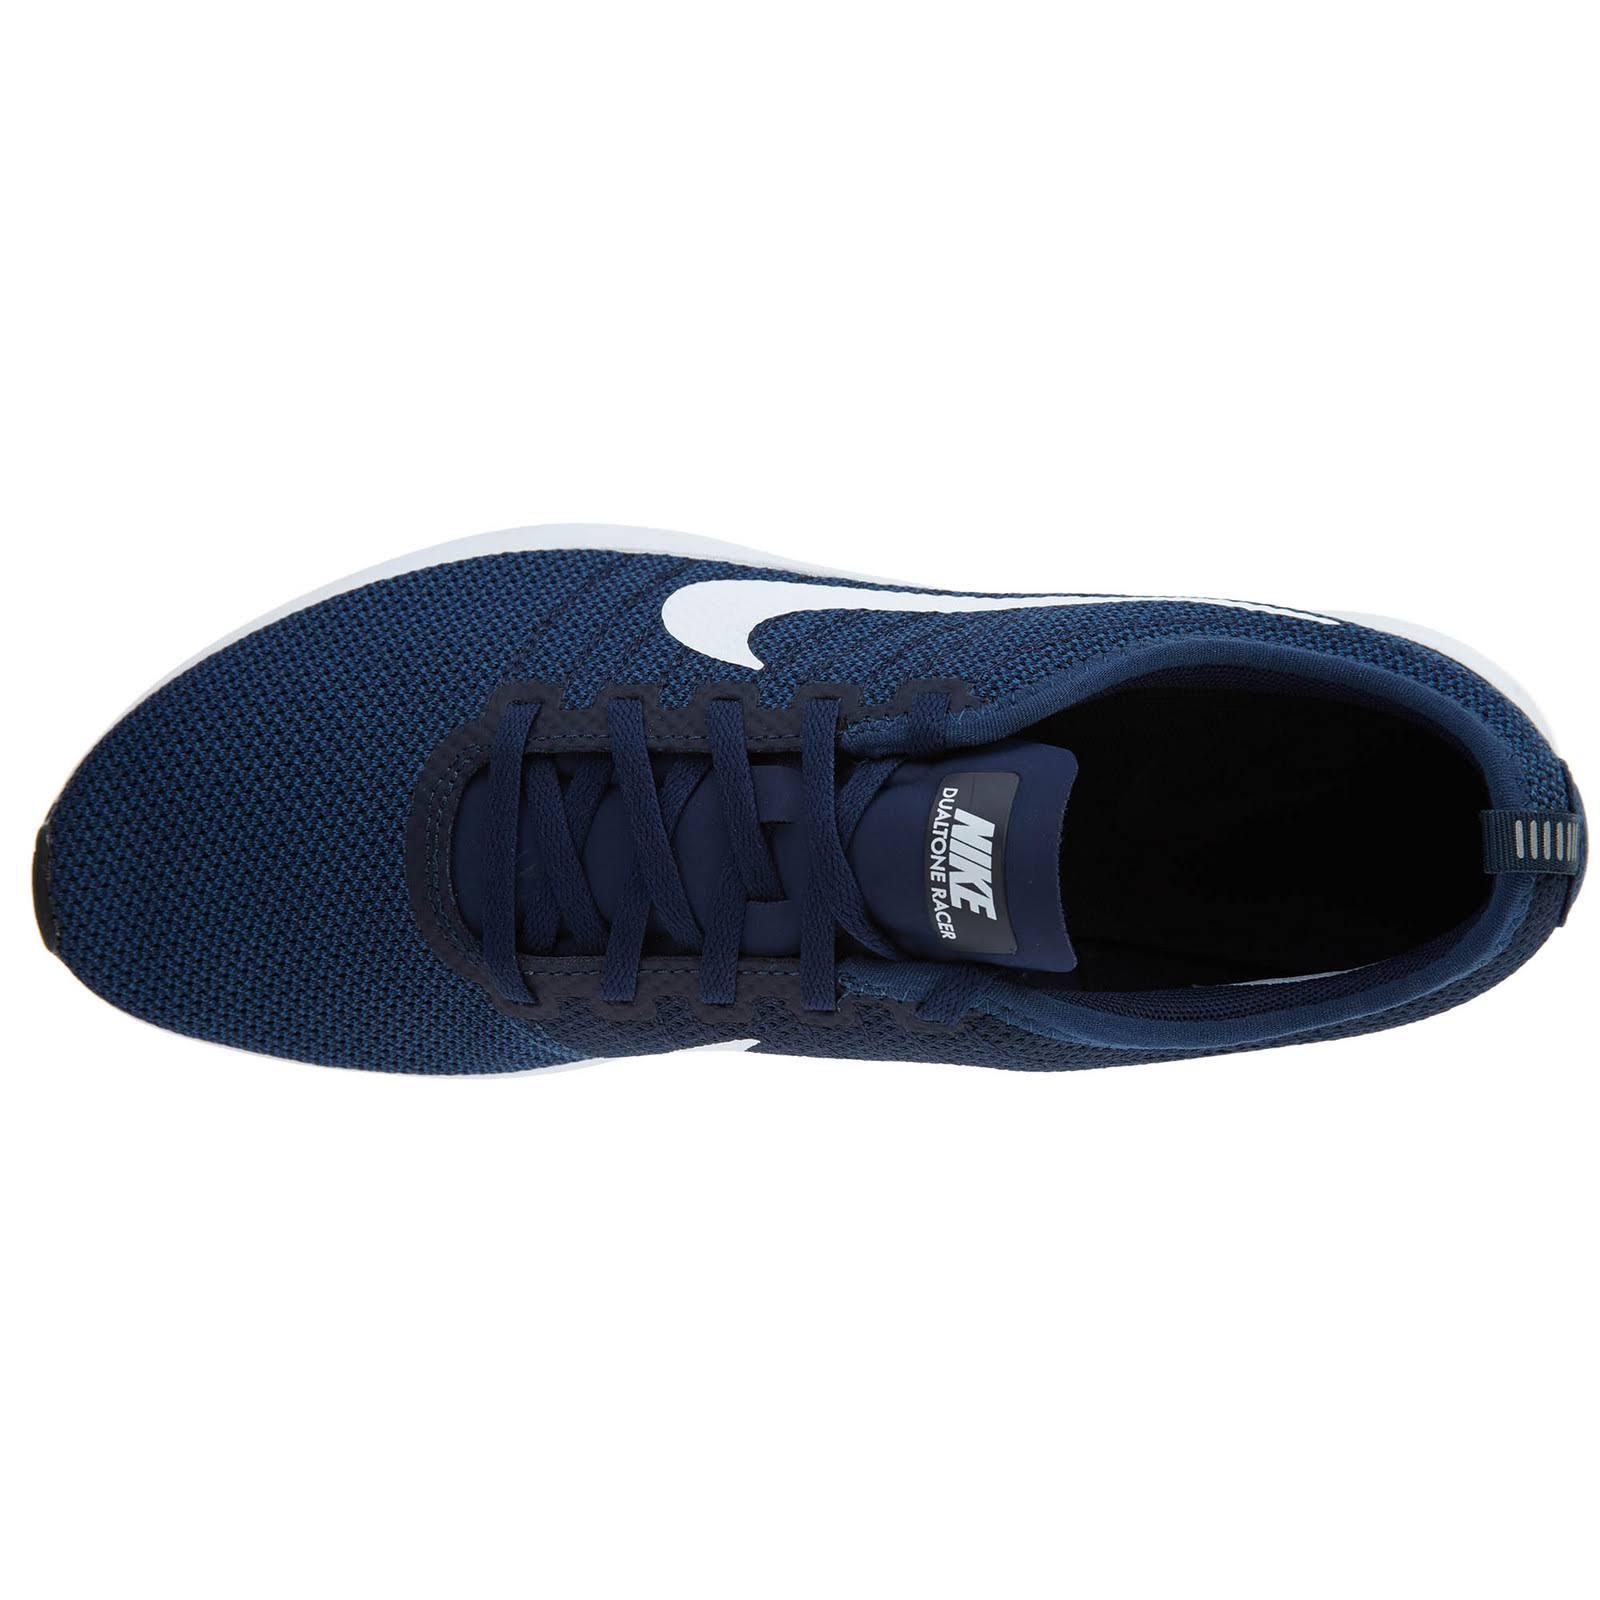 Blue Navy Dualtone Racer Trainer Nike qz0wBpxC